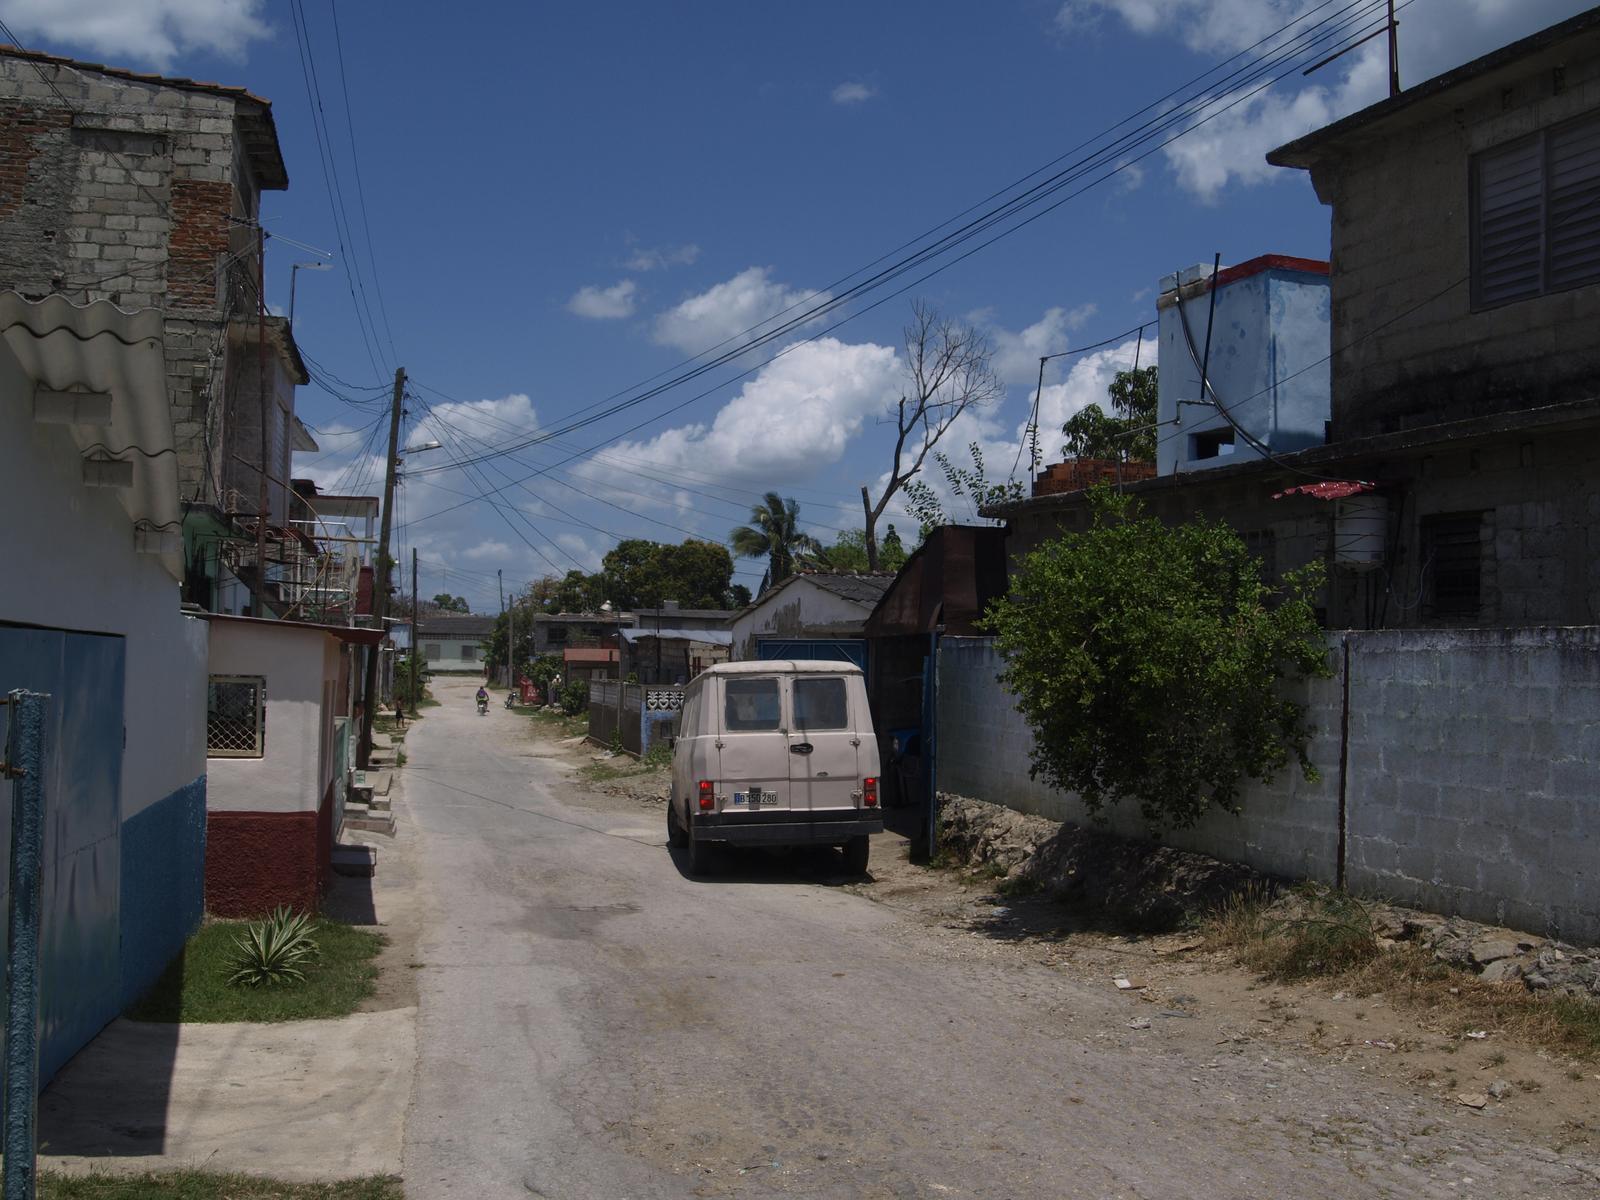 Kuba architektúra - Aguada de pasajeros